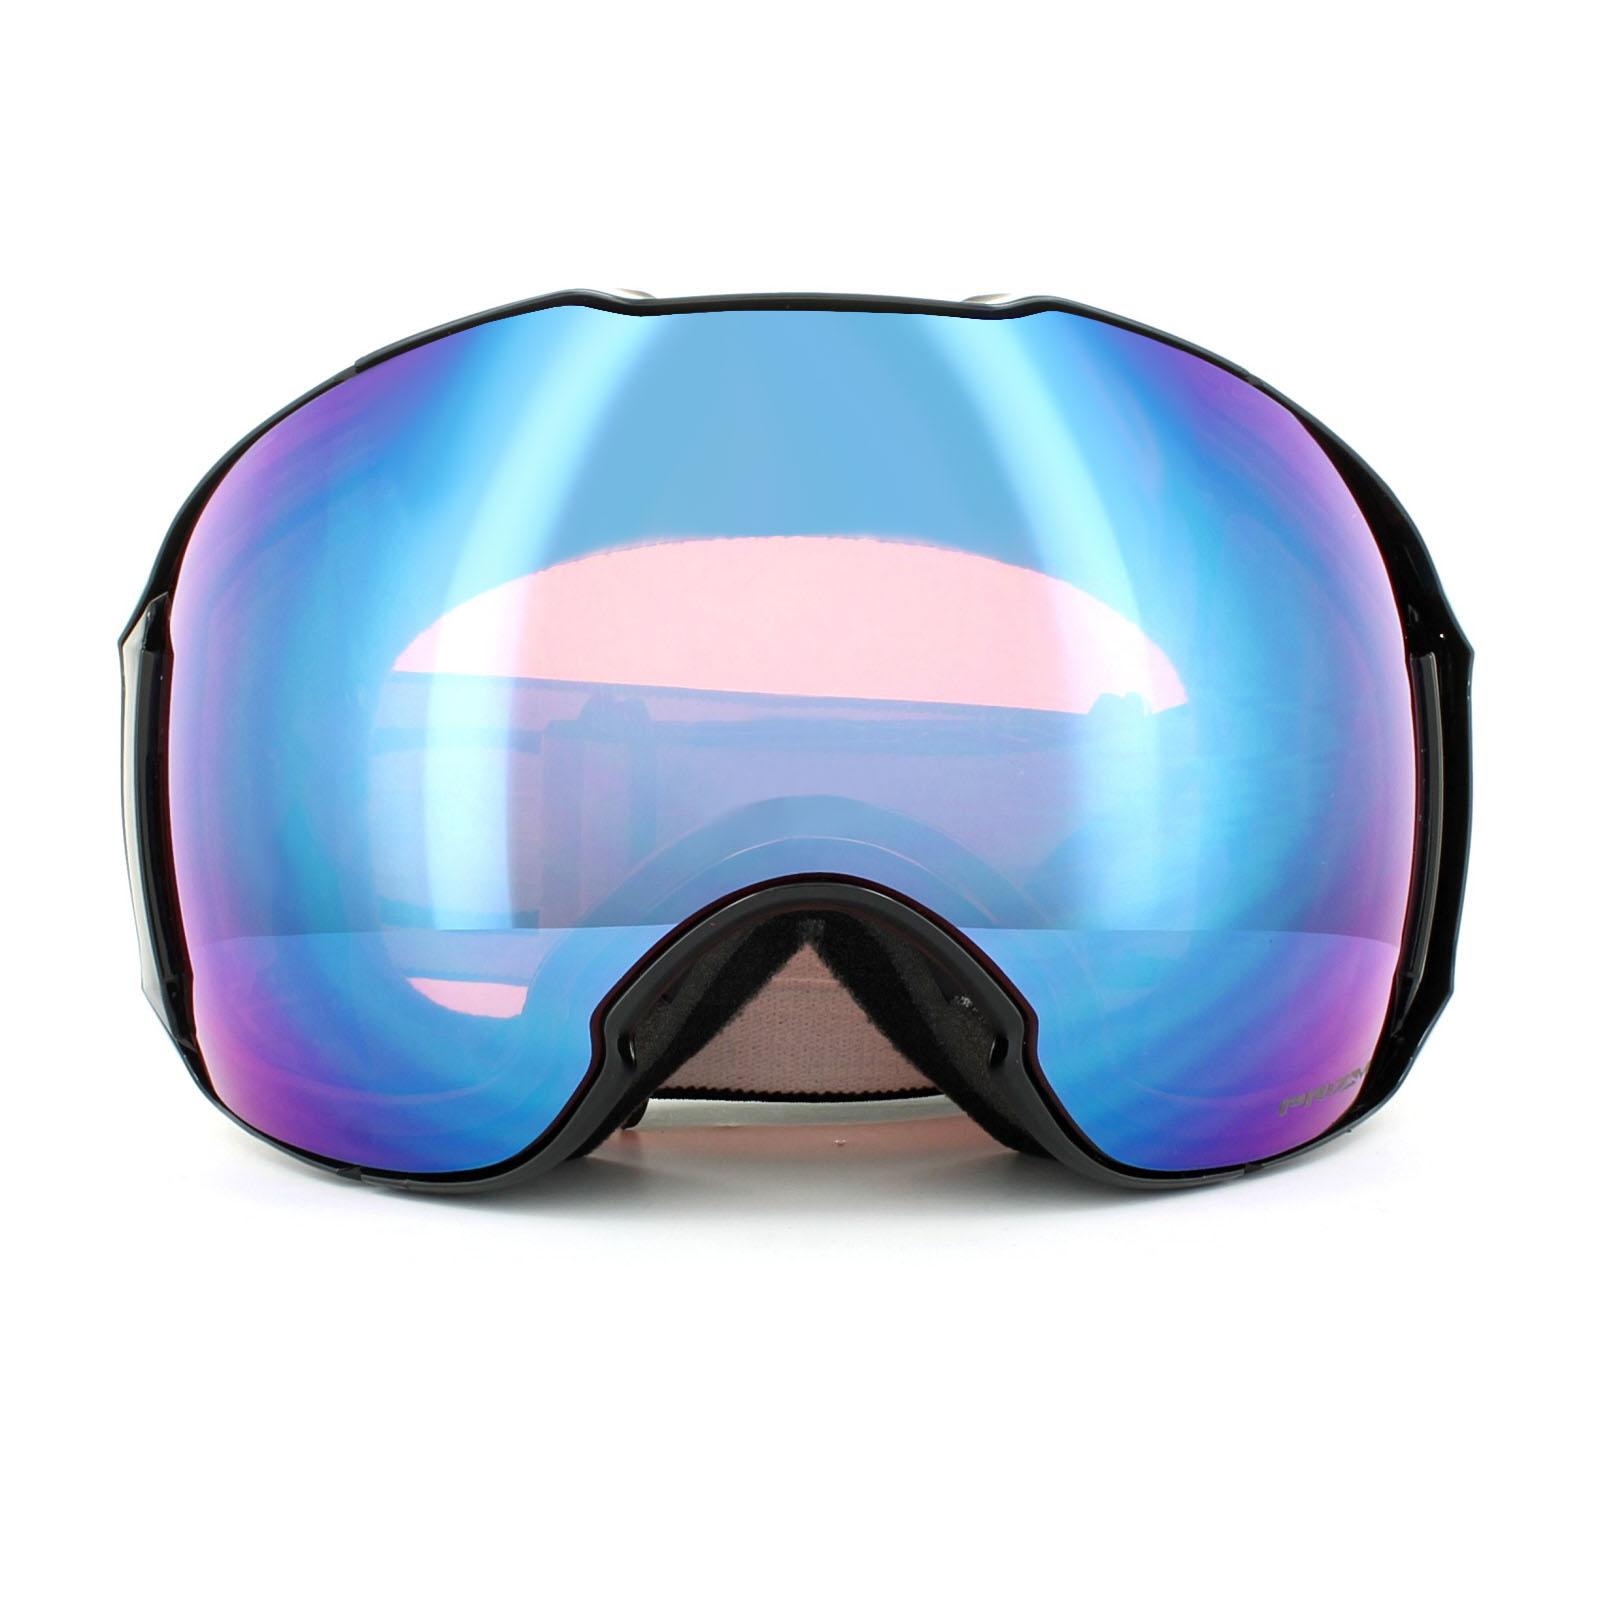 Cheap Oakley Airbrake Xl Goggles Discounted Sunglasses